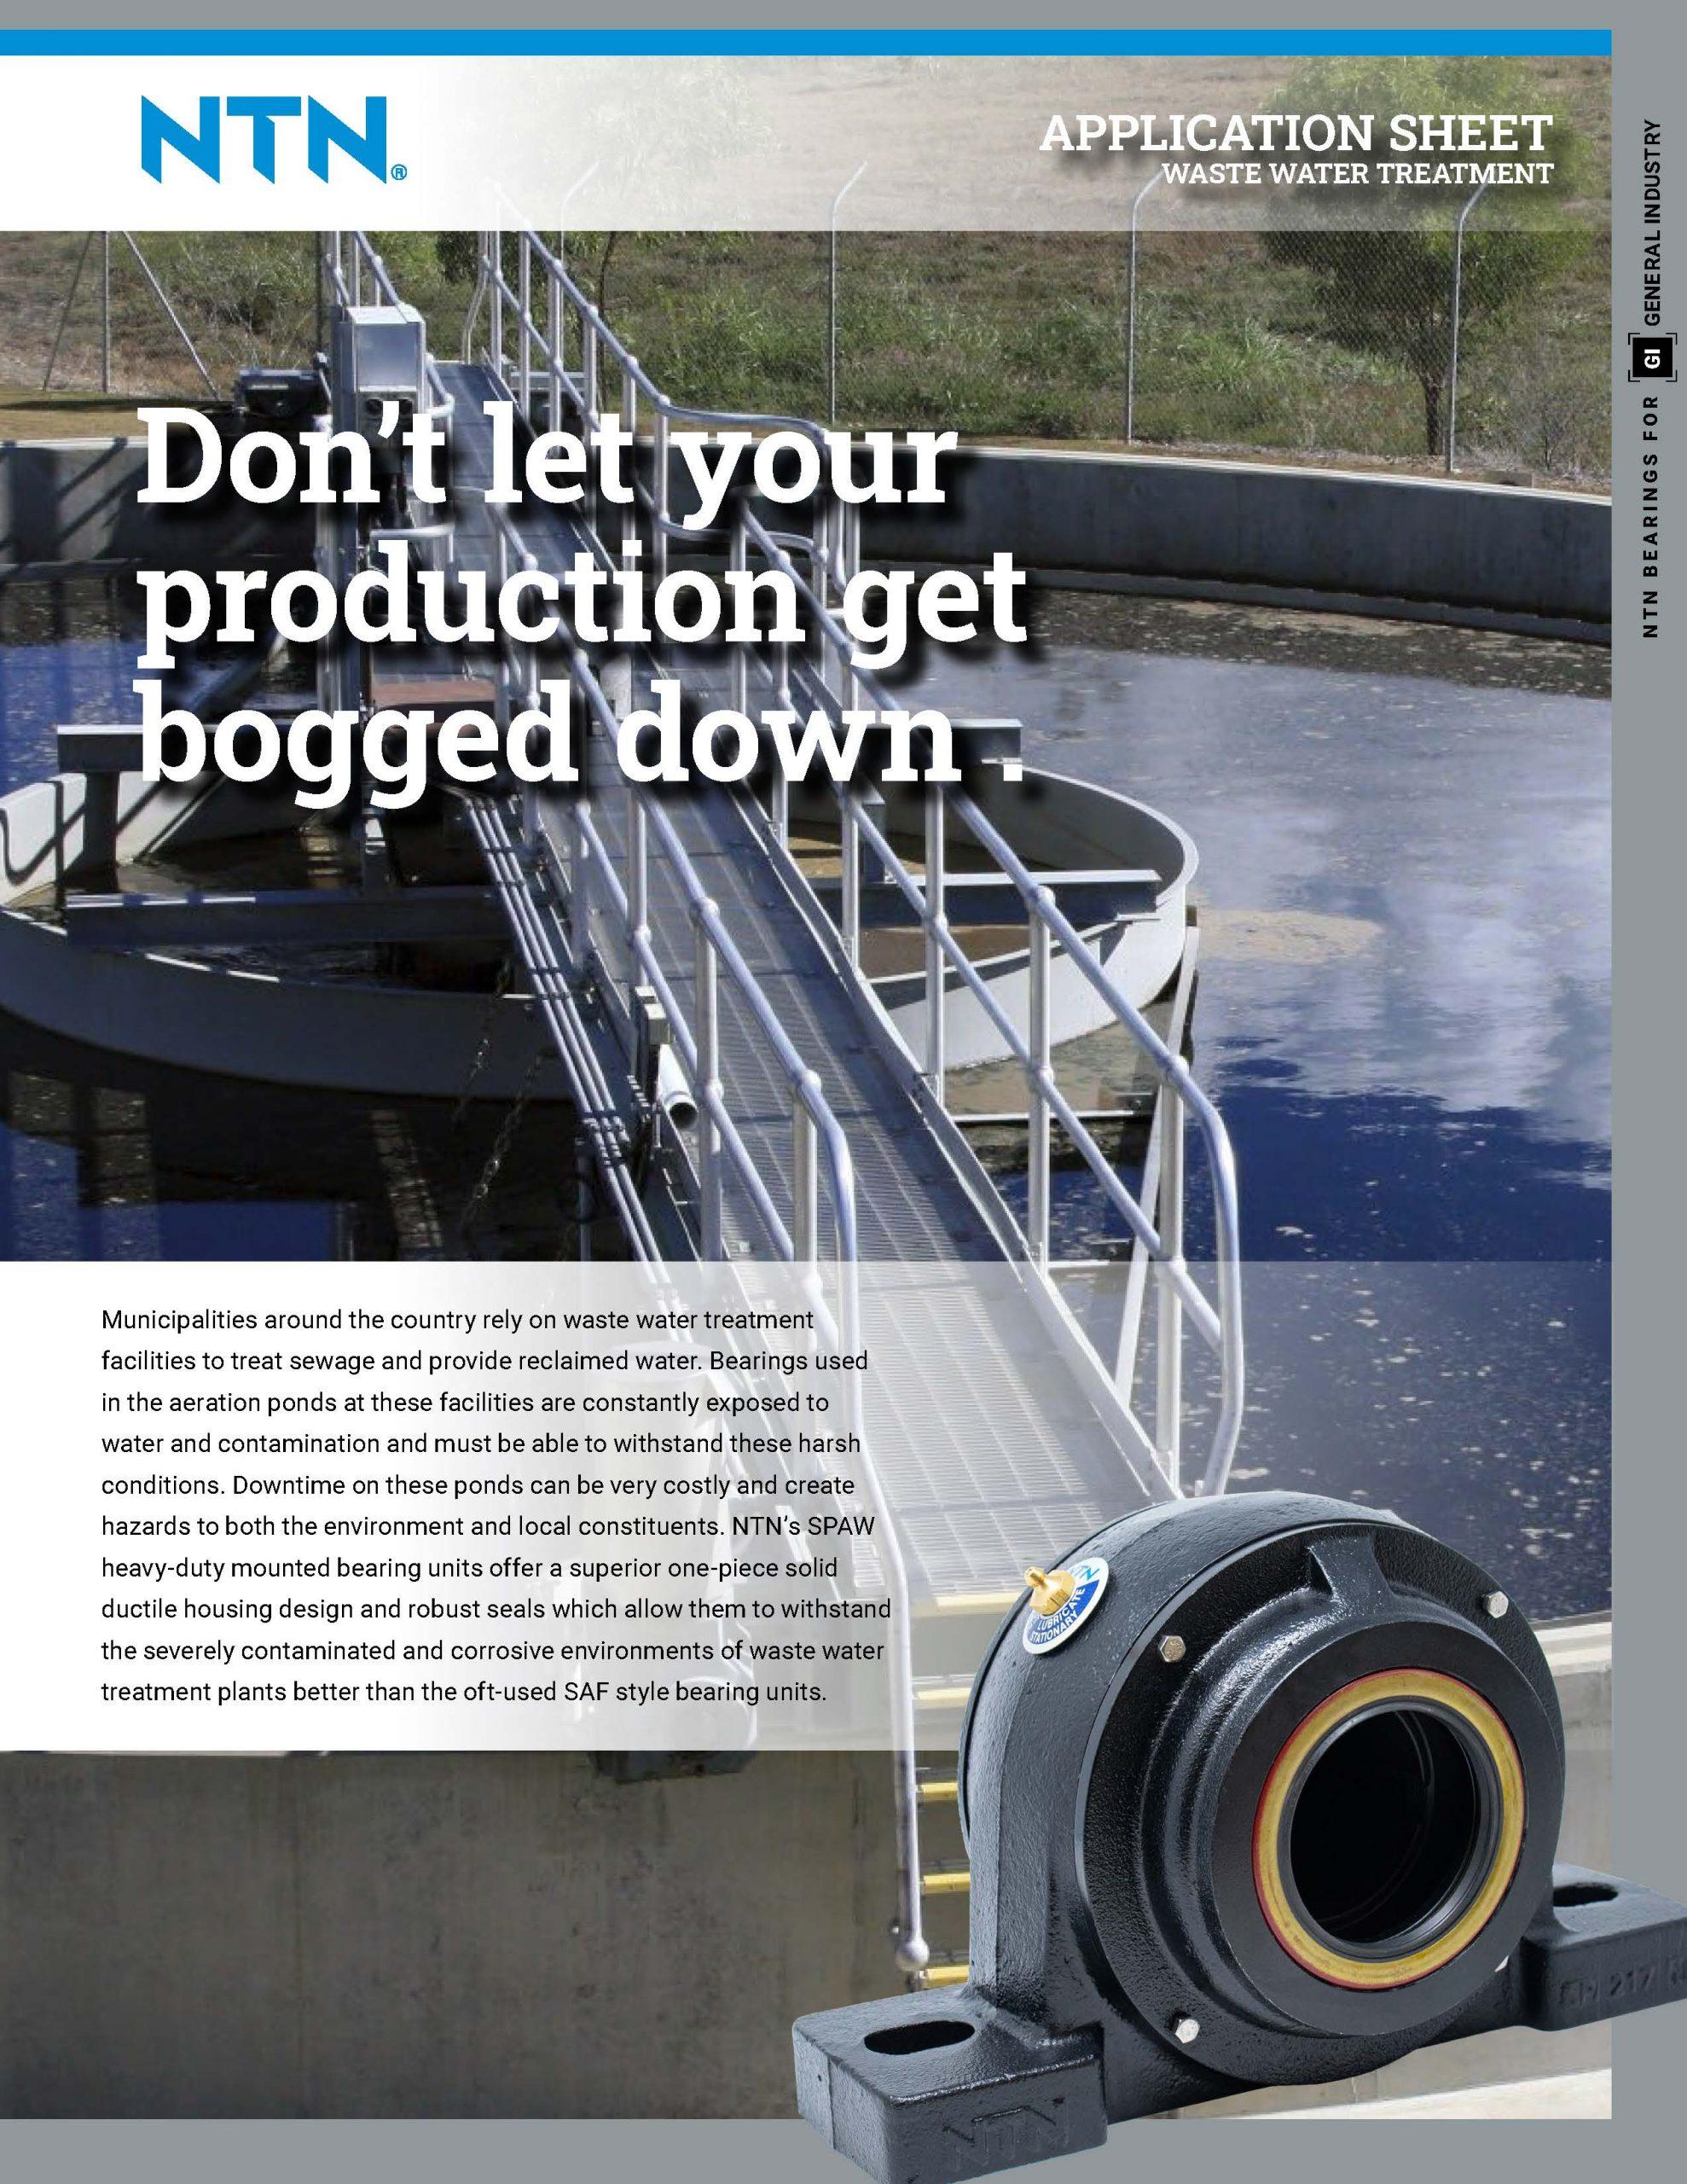 NTN-SPAW-Waste Water-App Sheet-20NTNWWTAS_Page_1